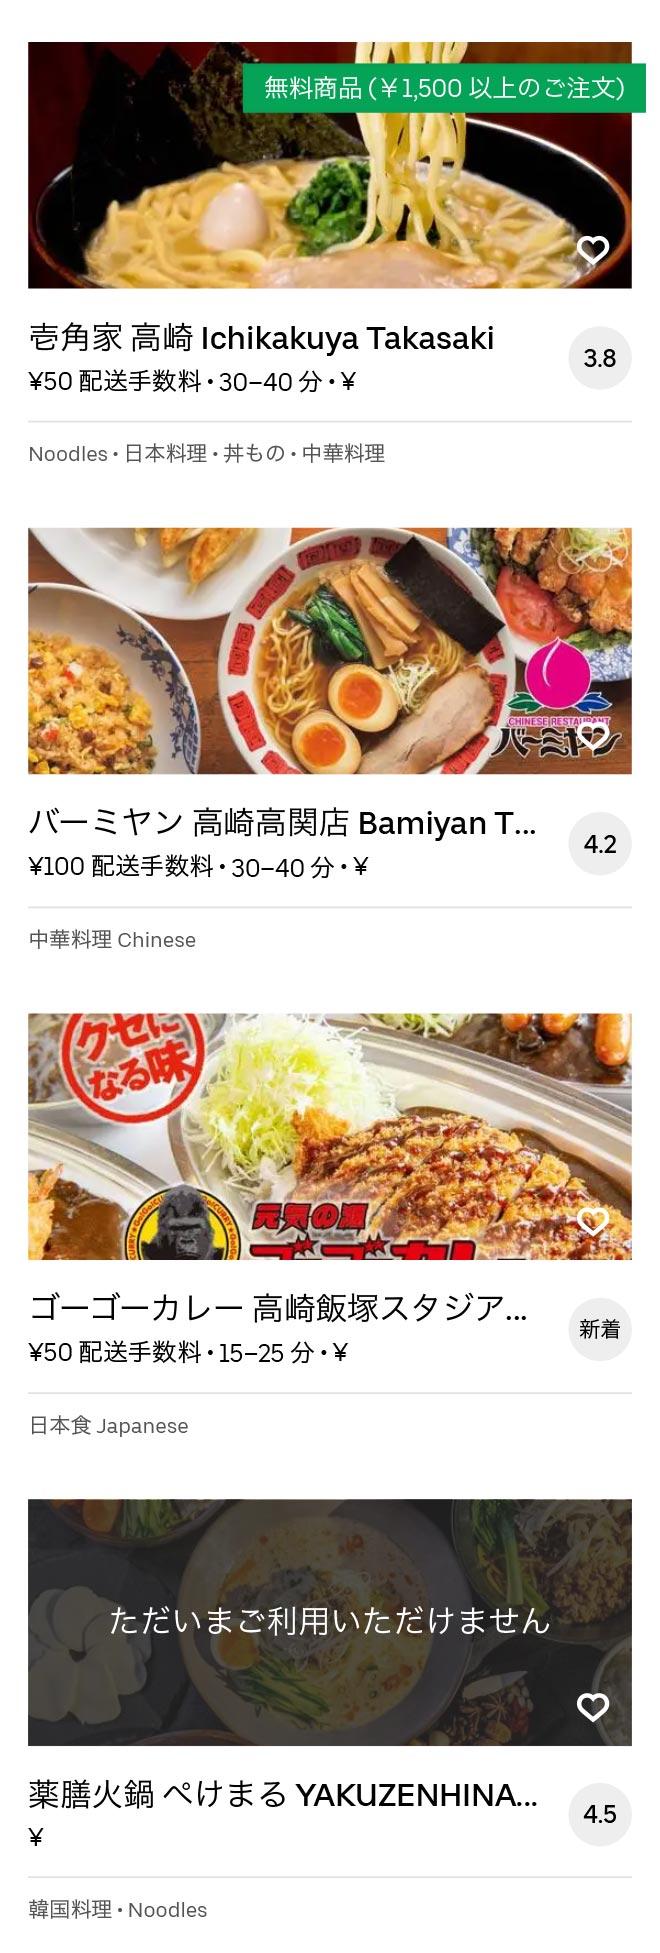 Tonyamachi menu 2010 10